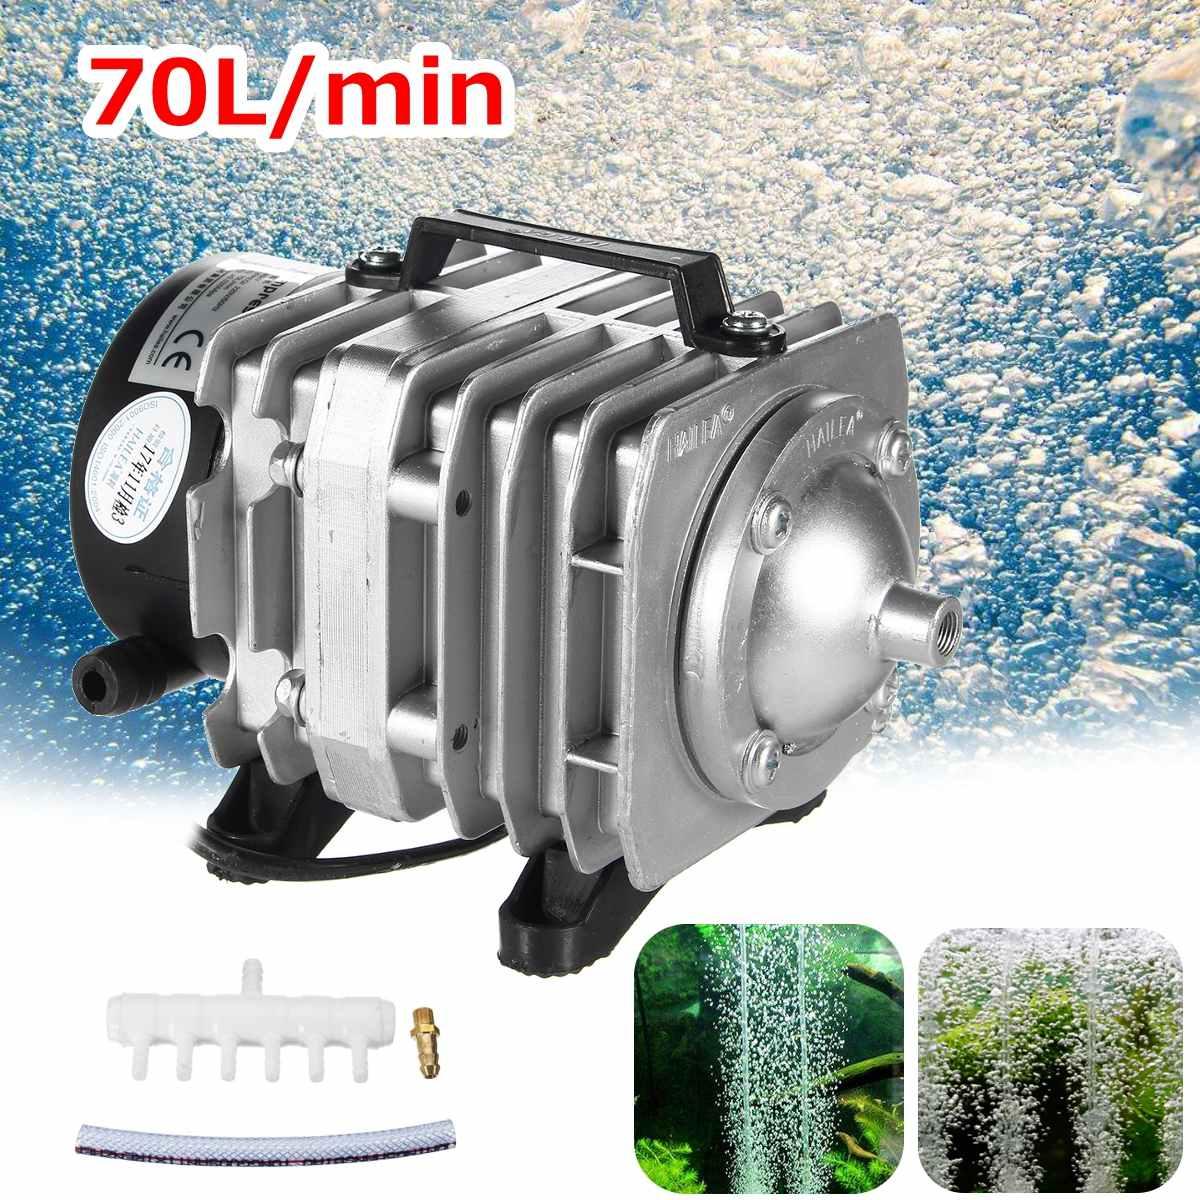 45W 220V ACO-318 Hailea 70L/min Electromagnetic Air Compressor Portable Koi Fish Tank Bubble Aquarium Air Pump Pond Aerator